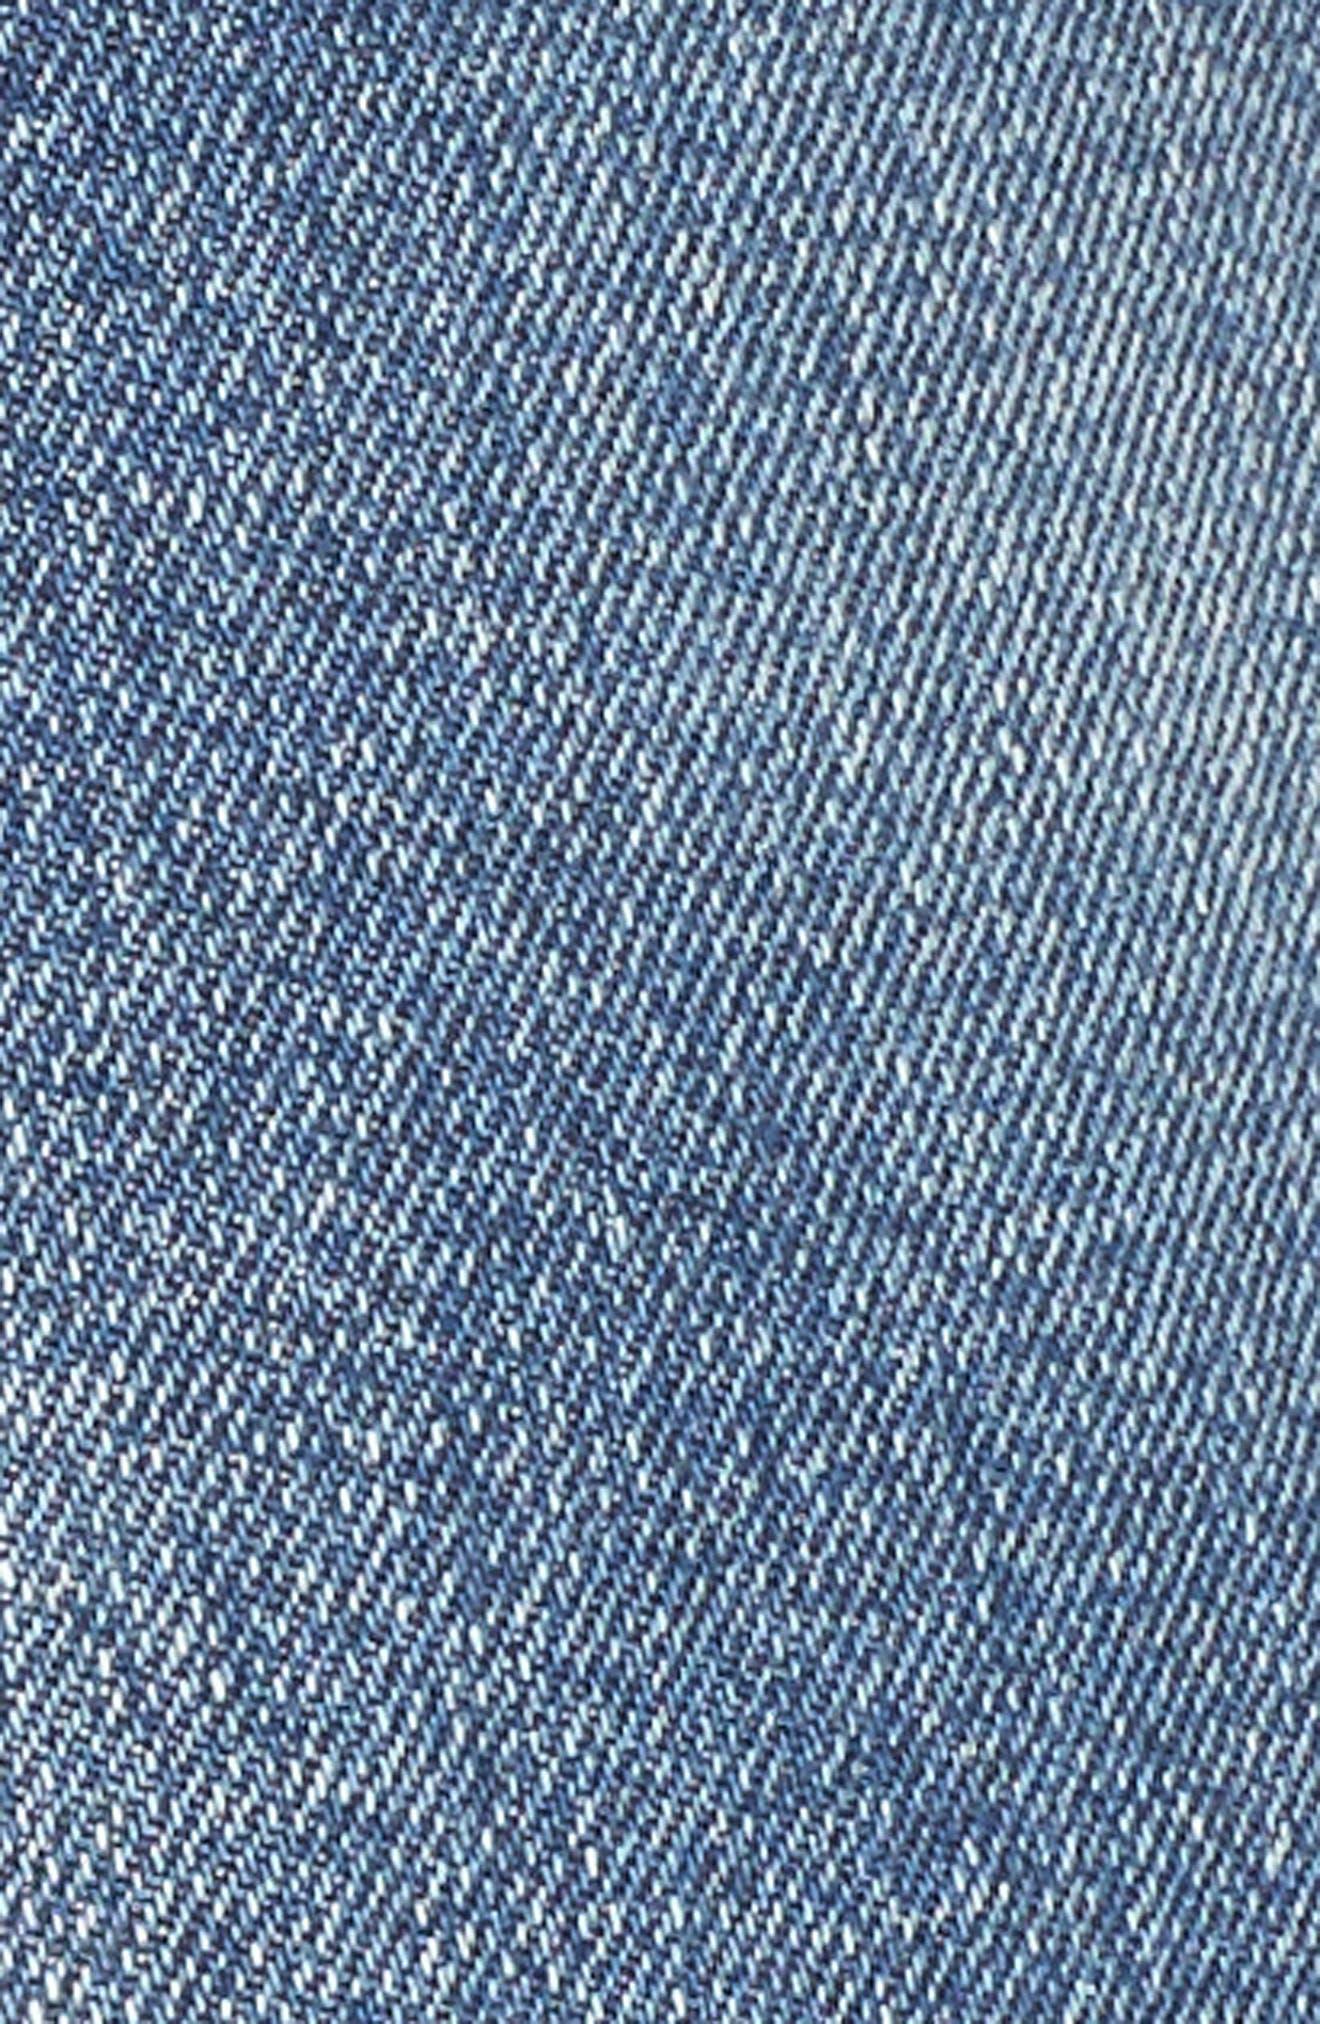 Pin-Up Distressed Denim Shorts,                             Alternate thumbnail 5, color,                             400